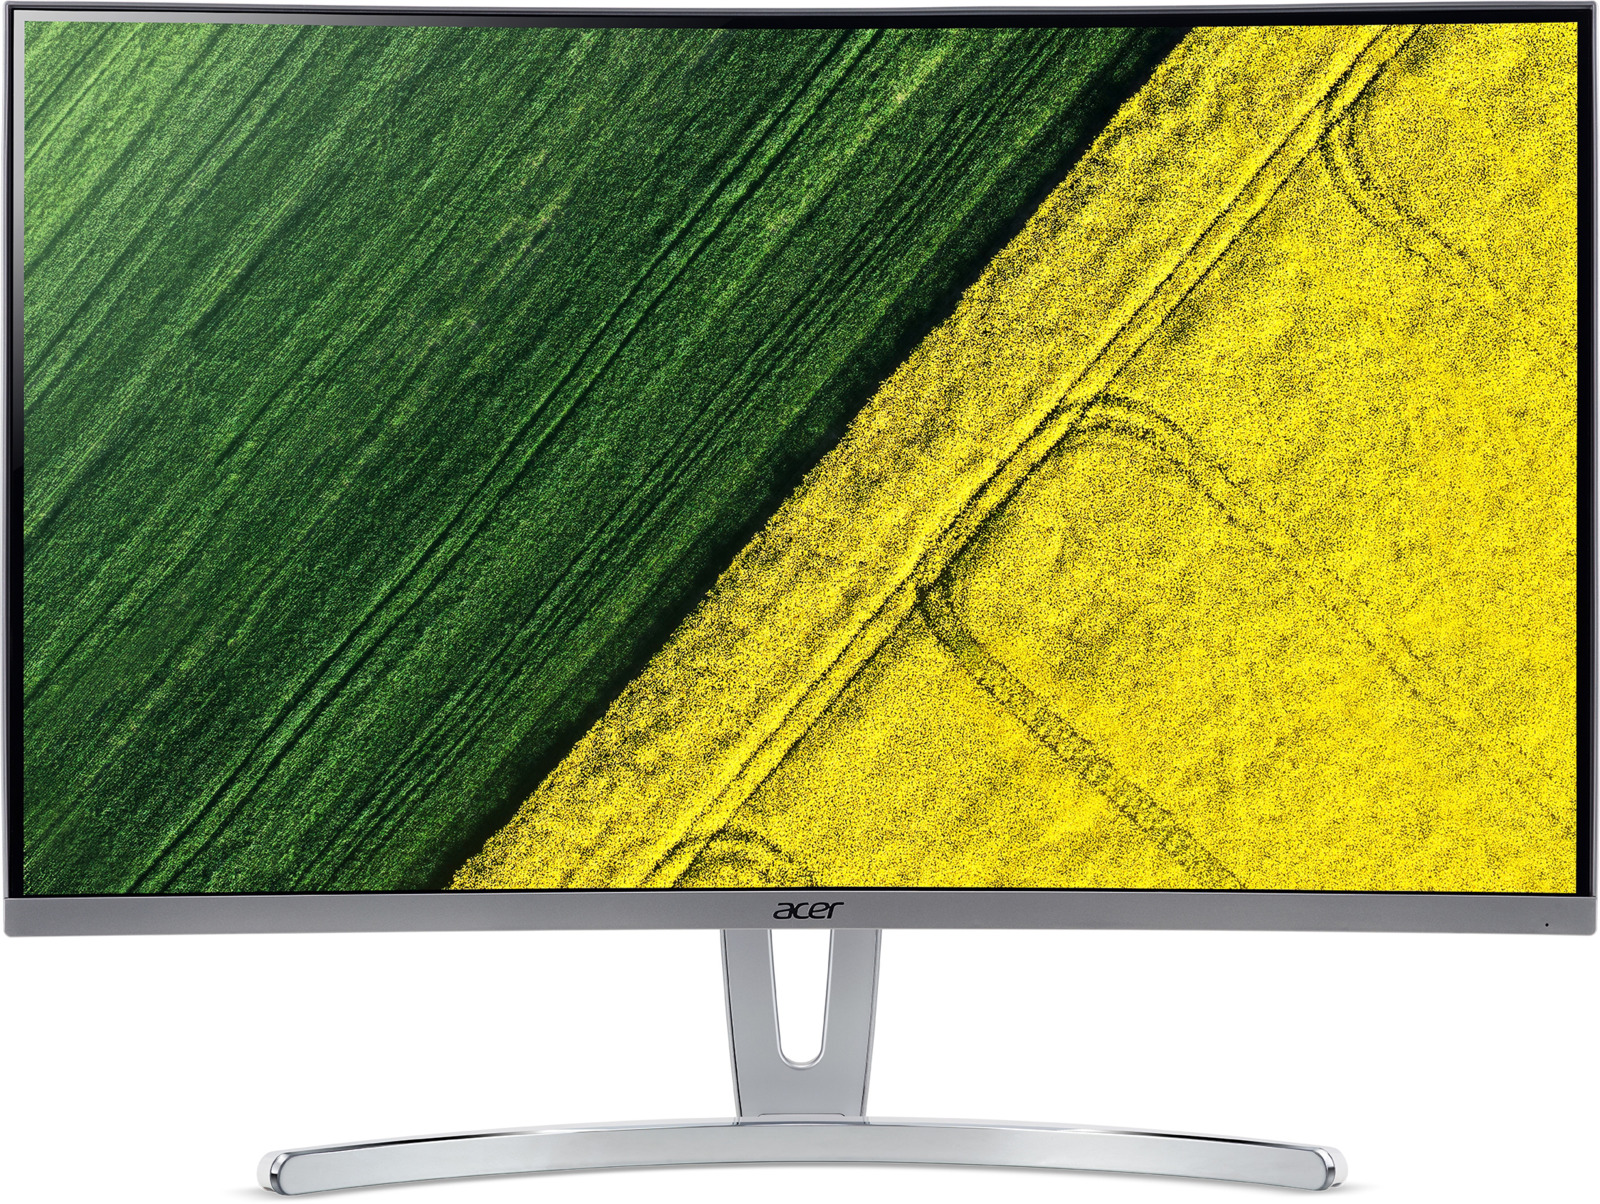 Монитор Acer ED273Awidpx, белый цены